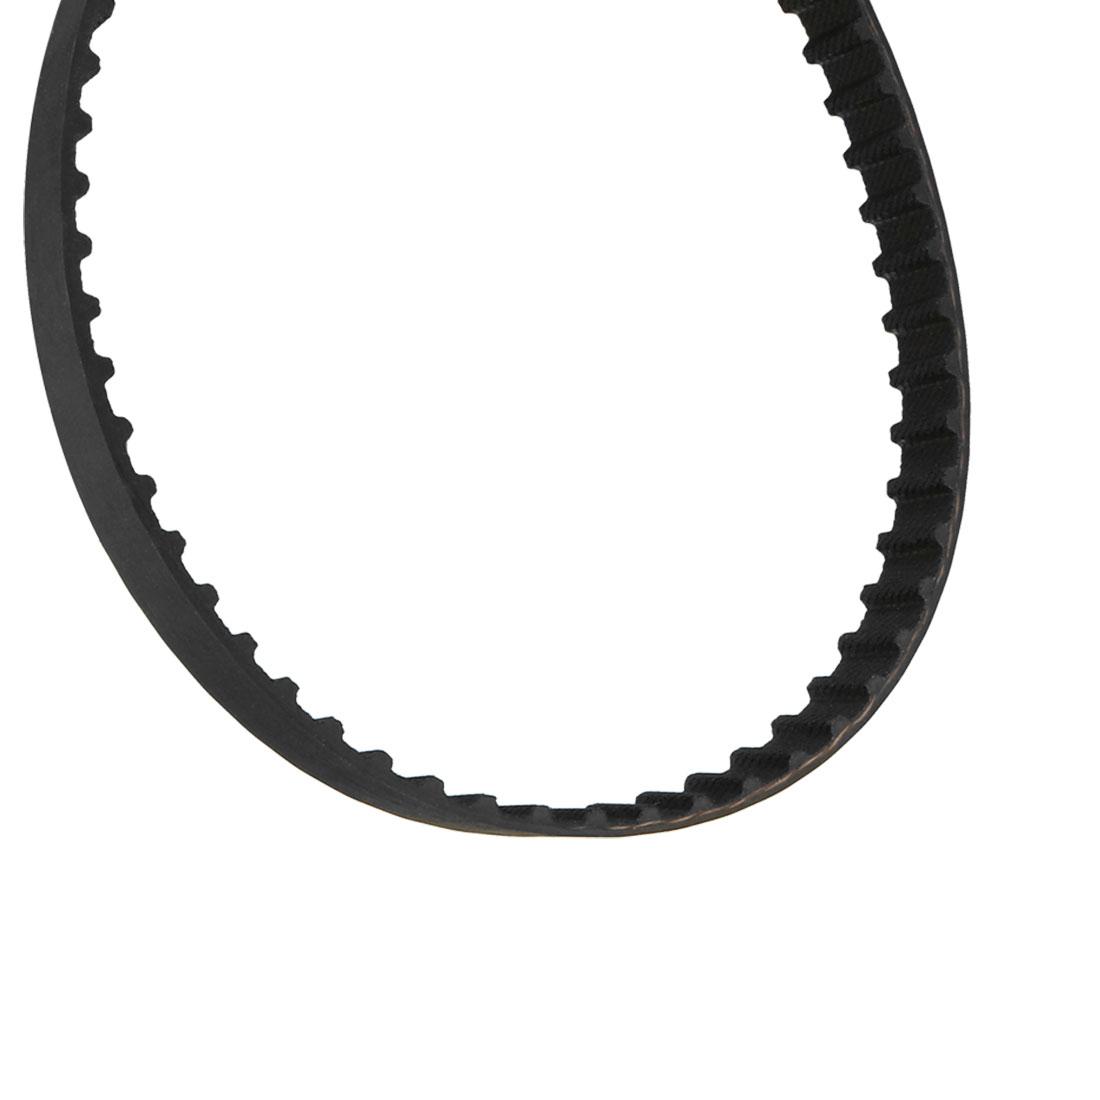 248XL 124 Teeth 10mm Width 5.08mm Pitch Stepper Motor Rubber Timing Belt Black